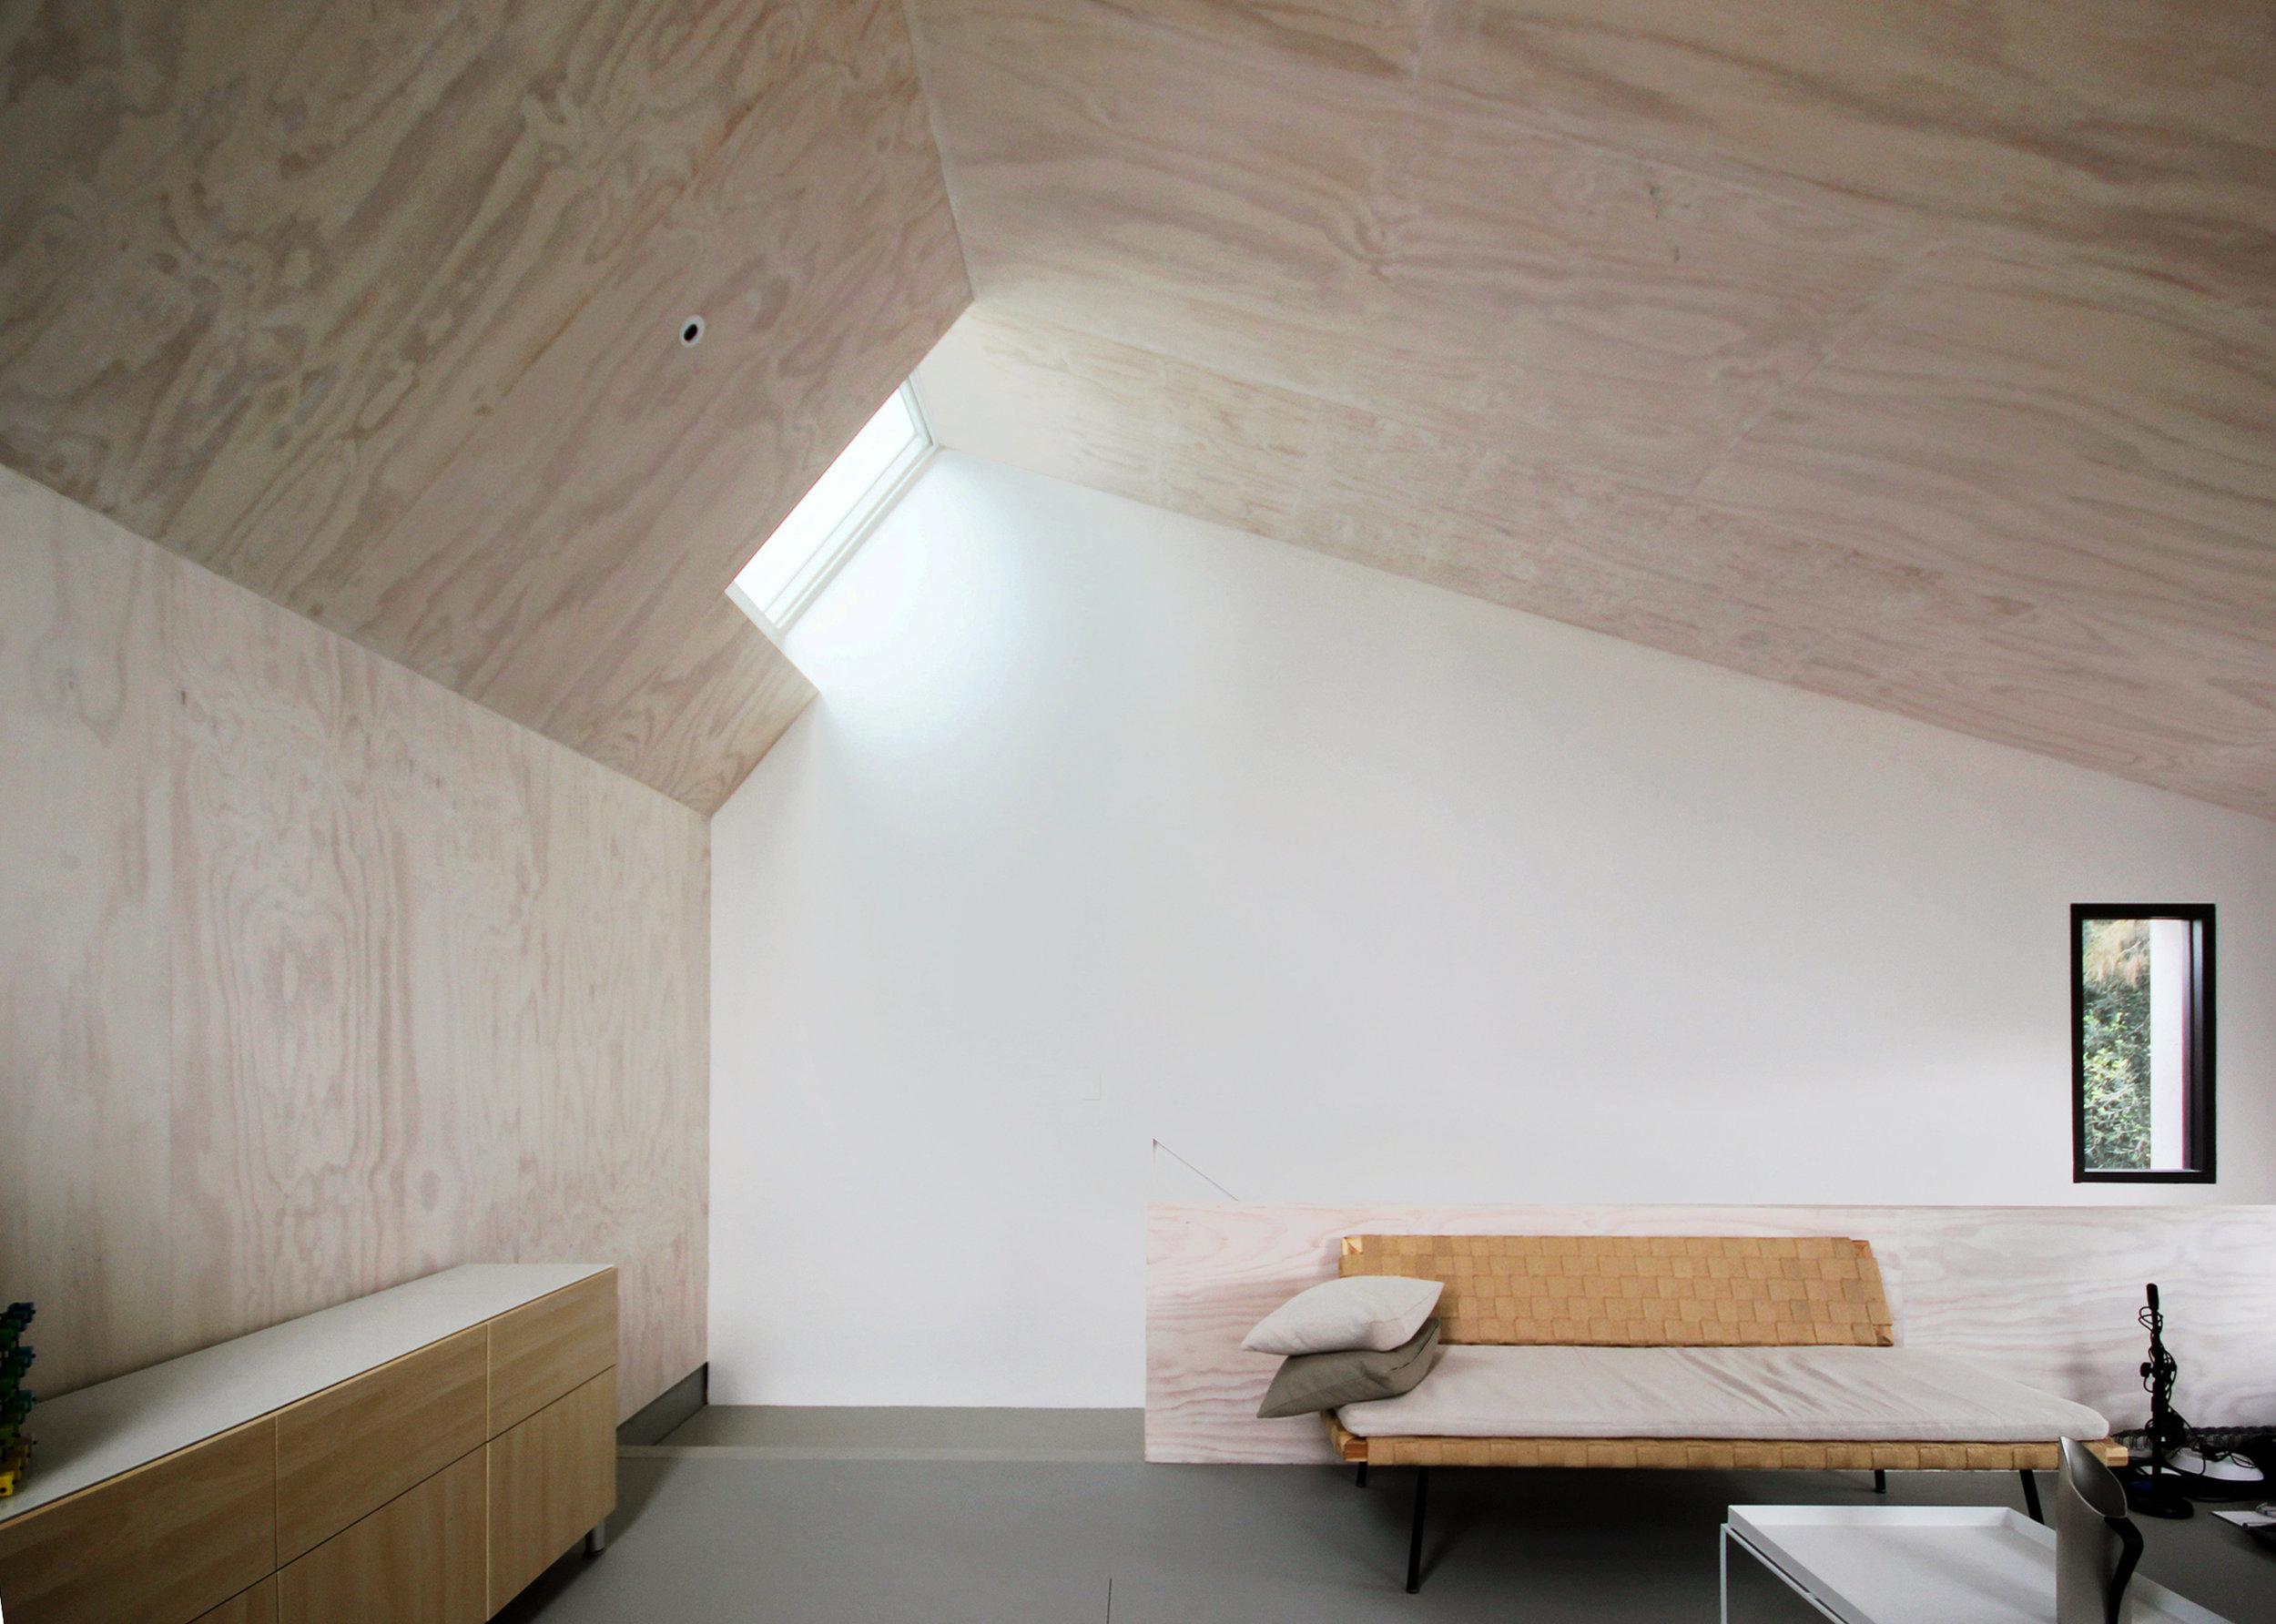 3476-small_Beach Office_Braham Architects_Ben Braham_08.jpg